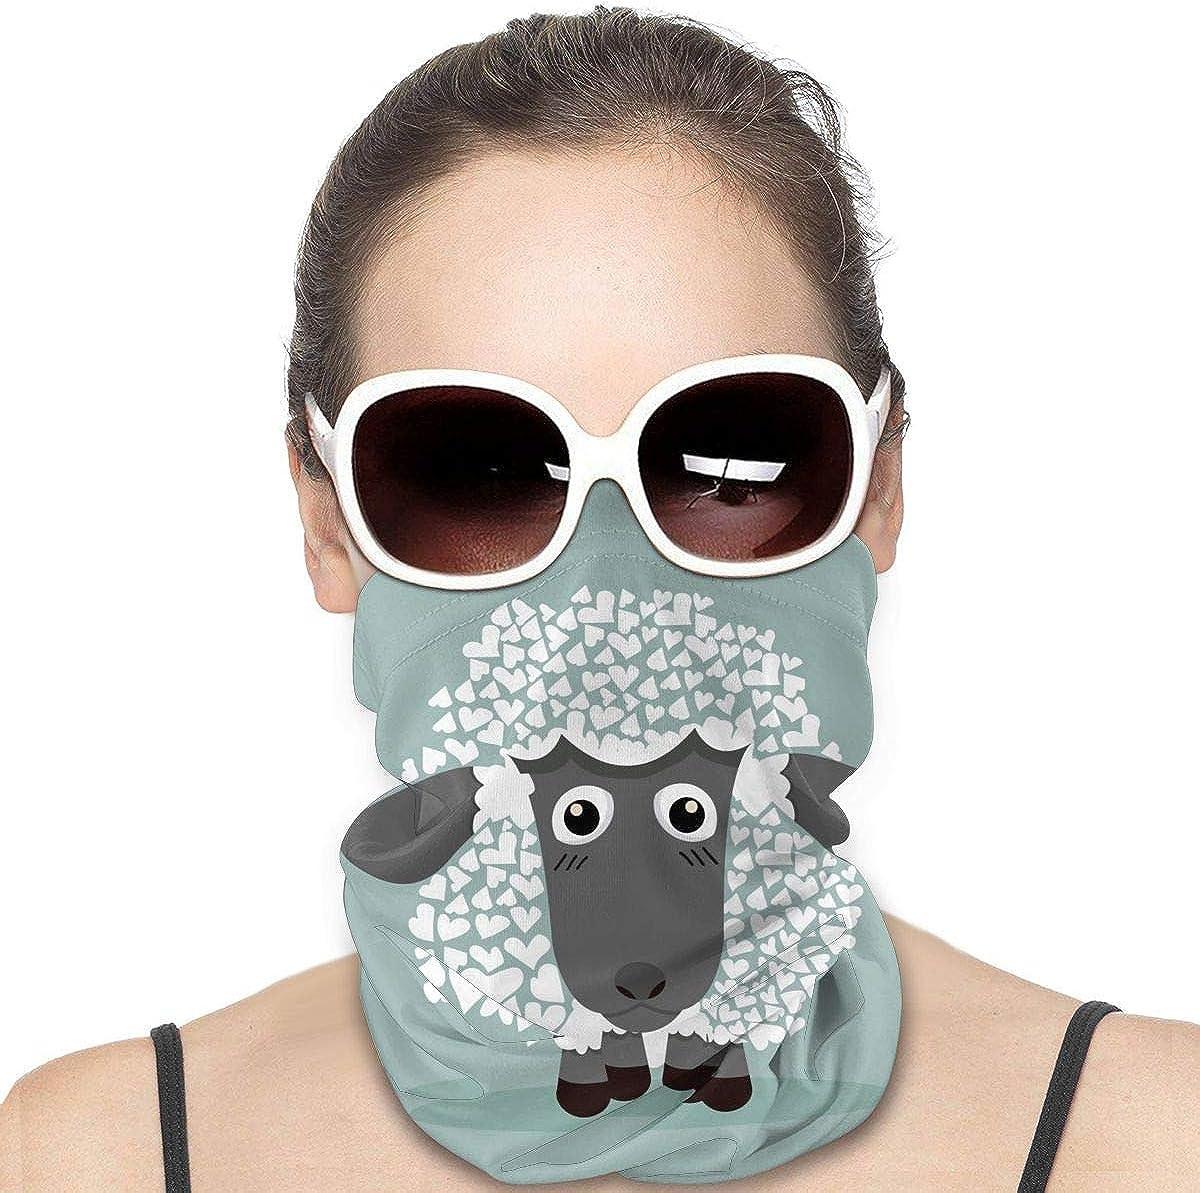 Dujiea Cute Alpaca Sheep Woman Seamless Bandana Dust Sun UV Protection Neck Gaiter Multifunctional Balaclava Face Mask for Motorcycling Hiking Fishing